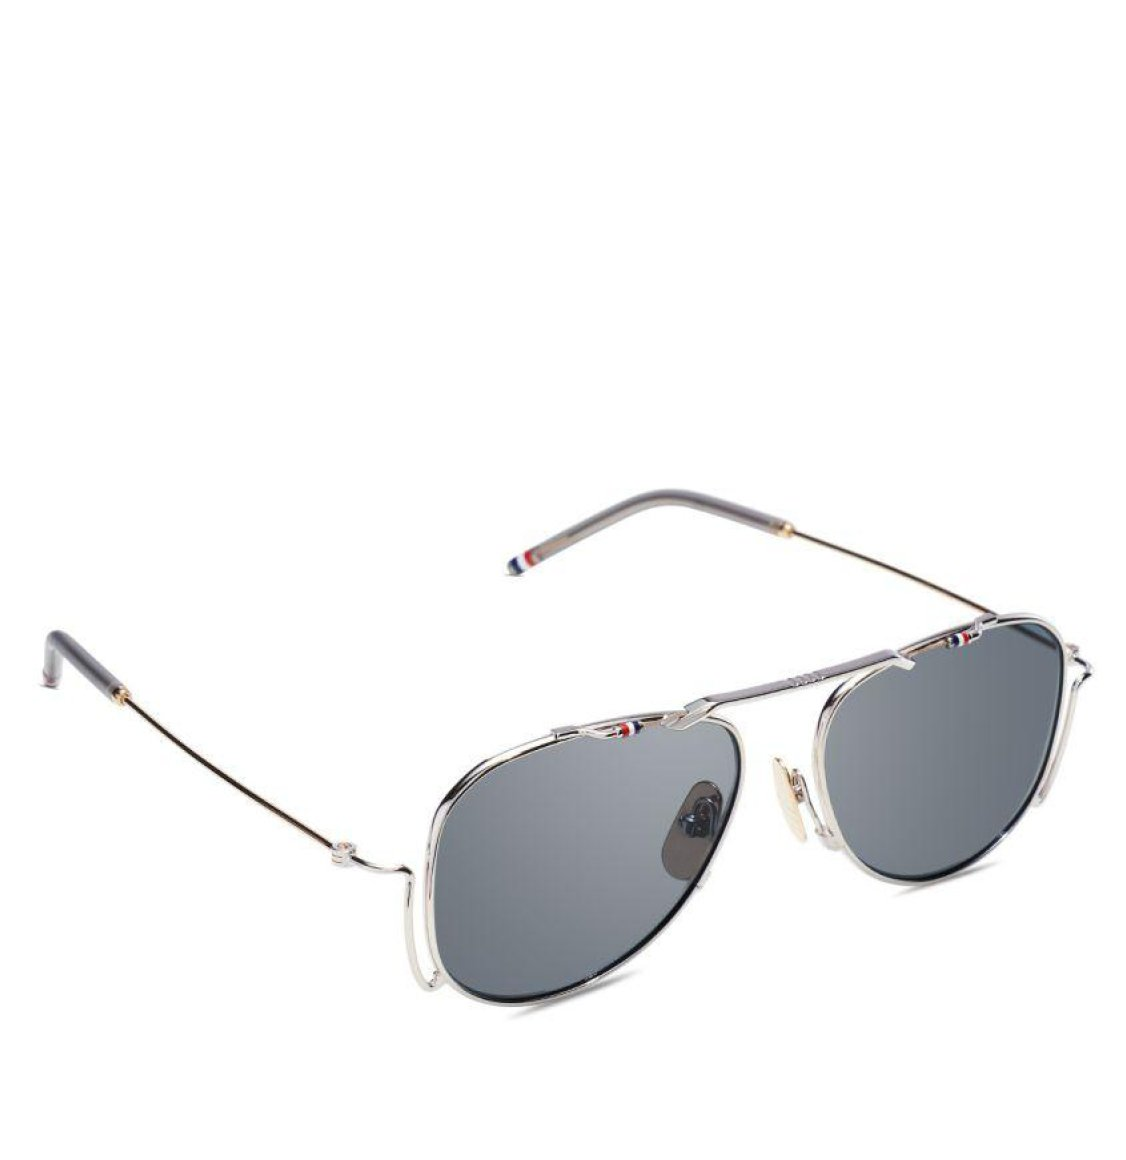 Thom Browne Silver White Gold Aviator Sunglasses Γυαλιά Ηλίου